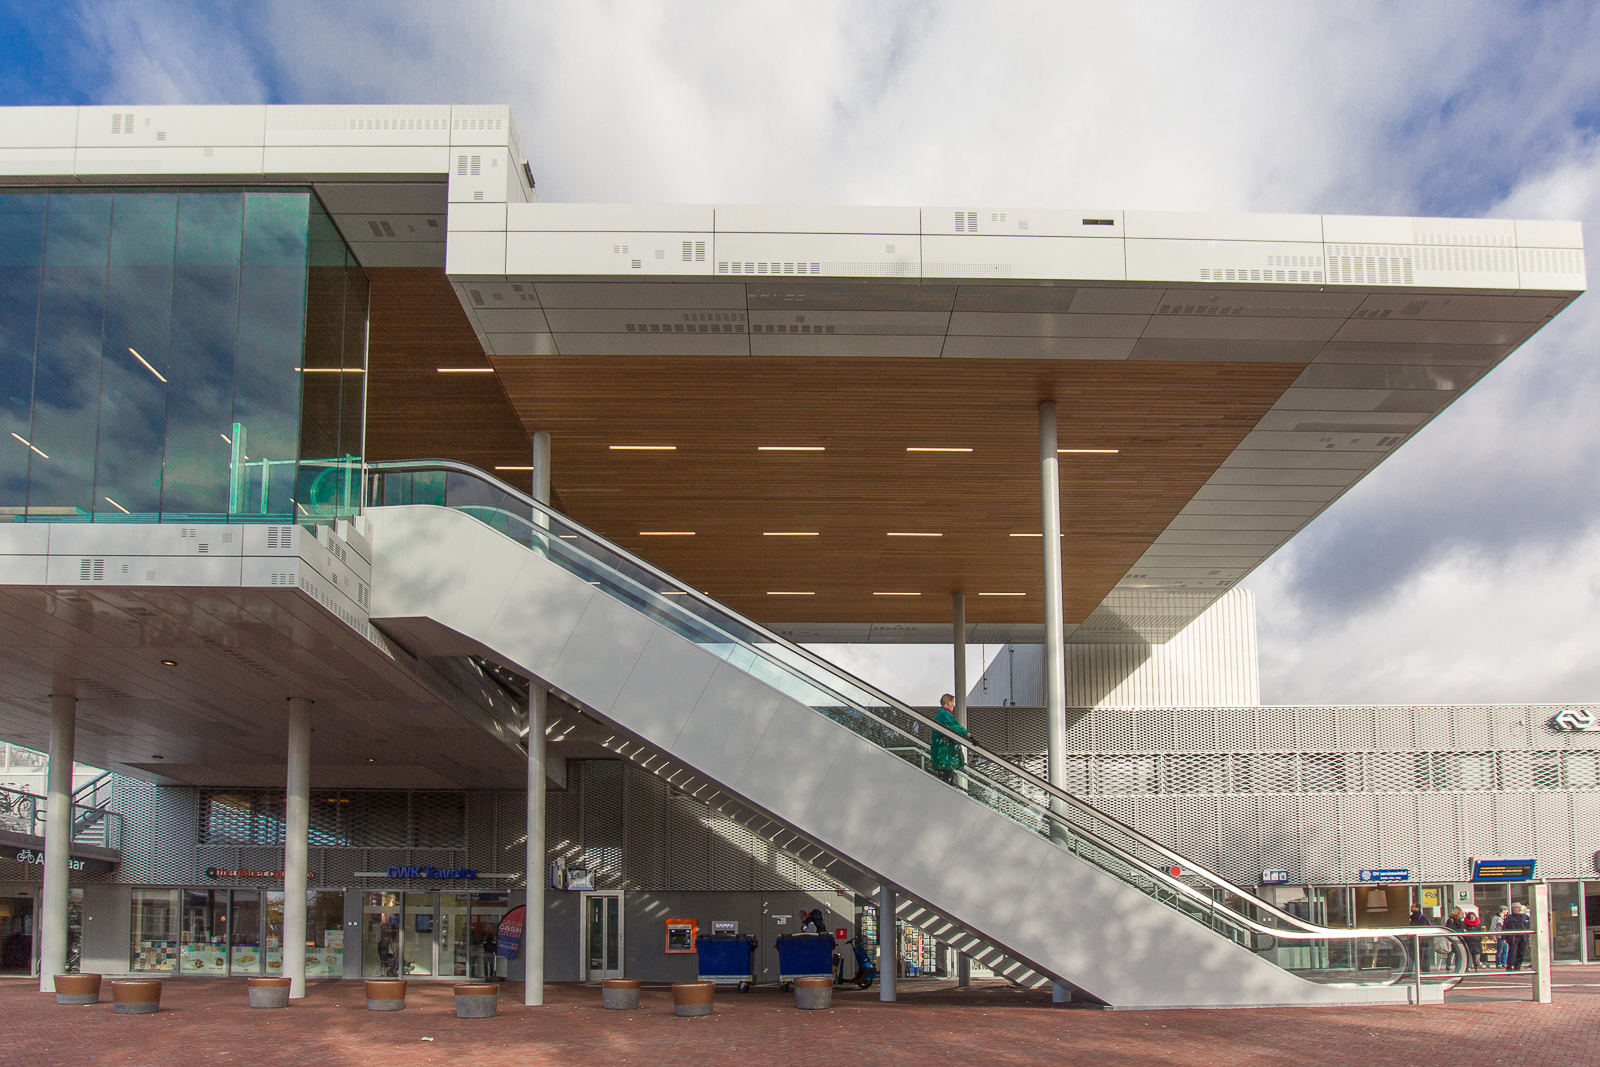 station_alkmaar_18